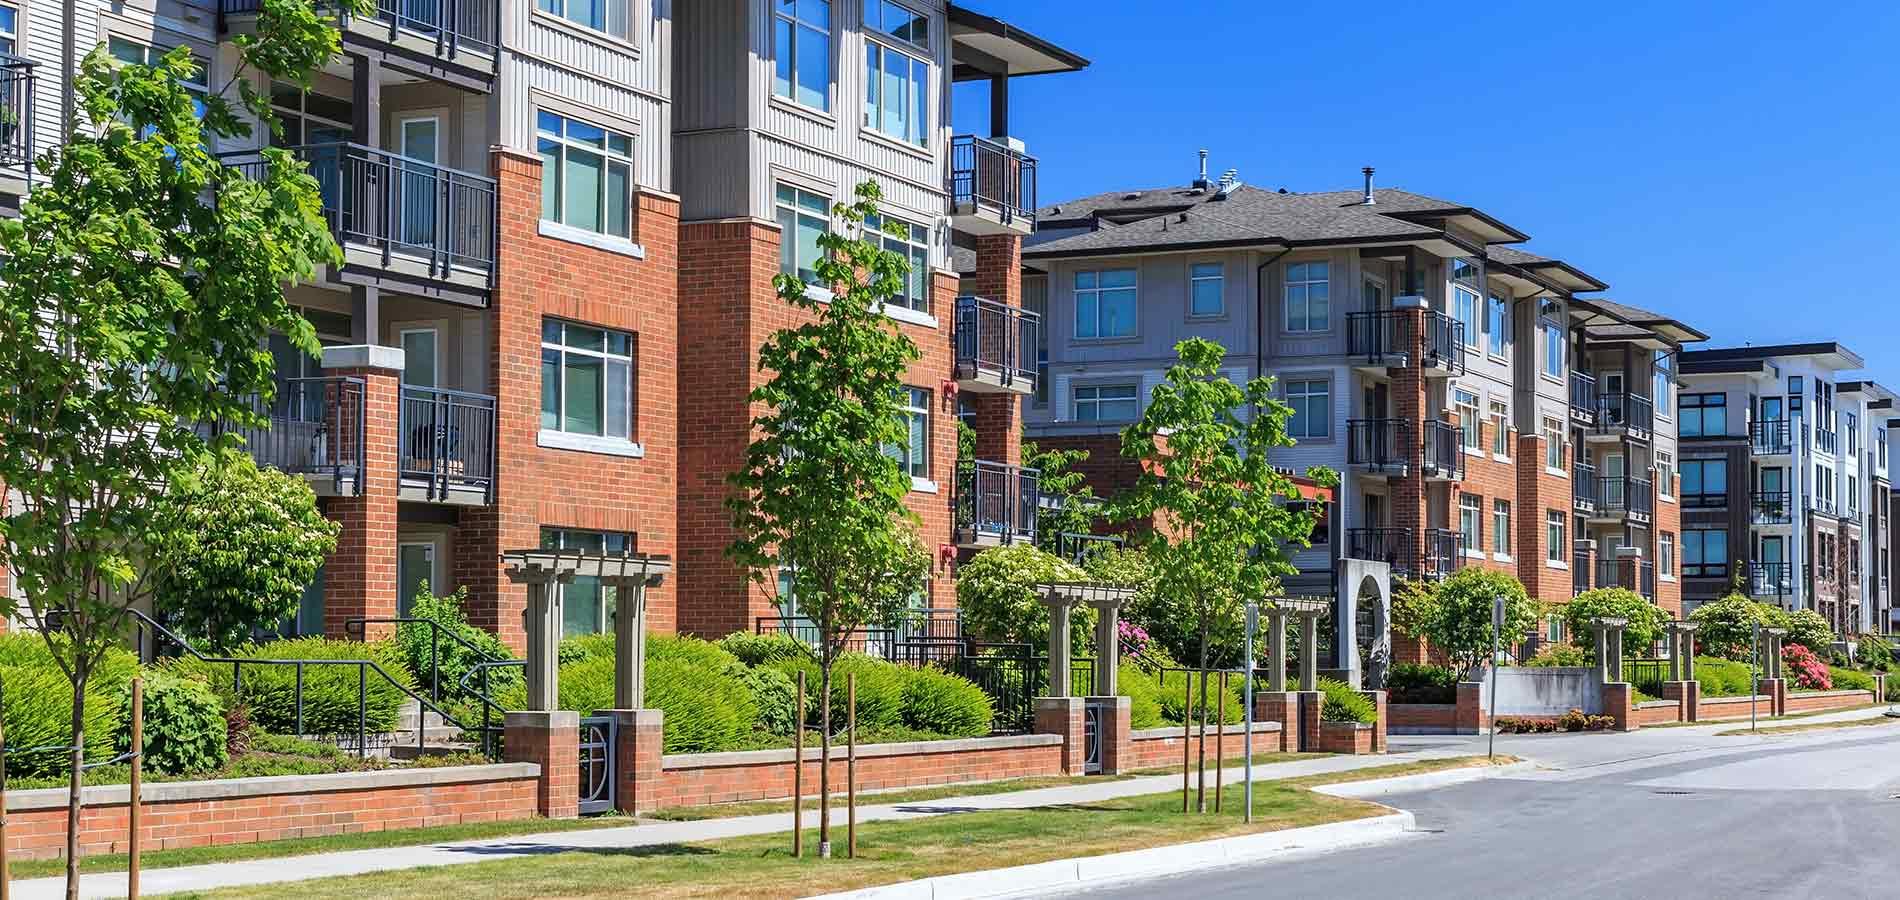 Jones & Roth Affordable Housing CPAs & Advisors